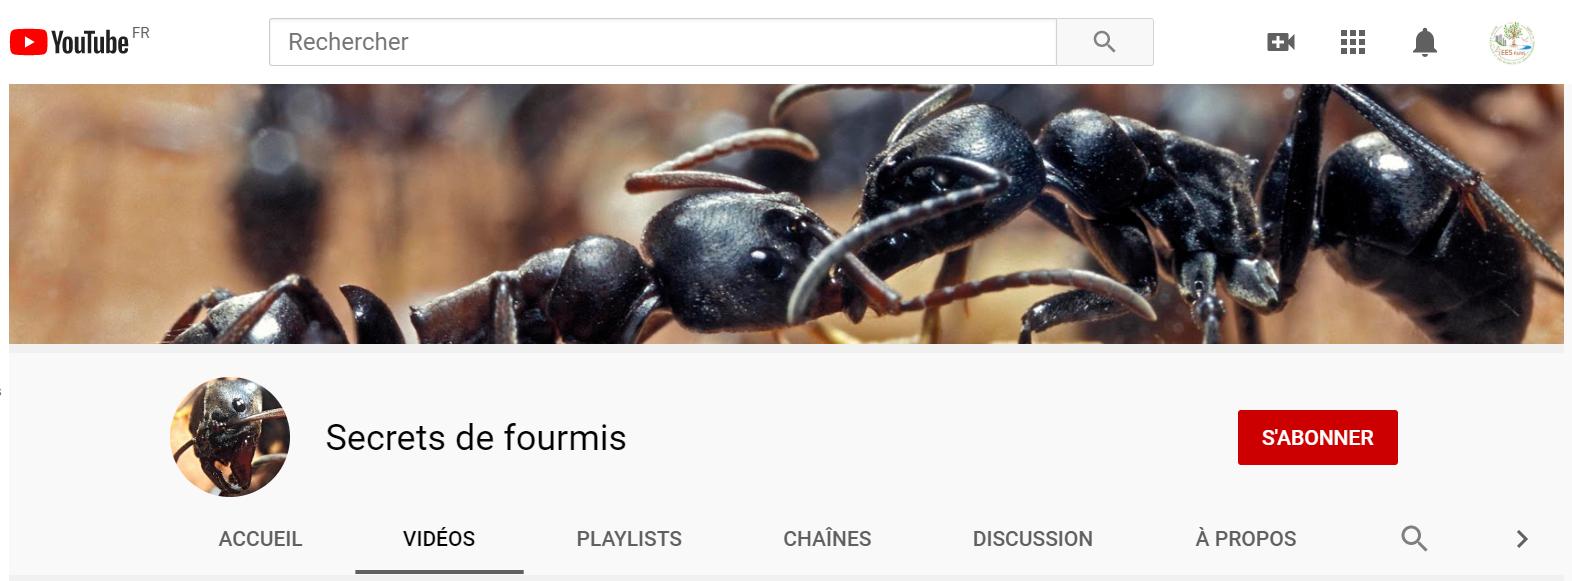 chaîne youtube fourmis